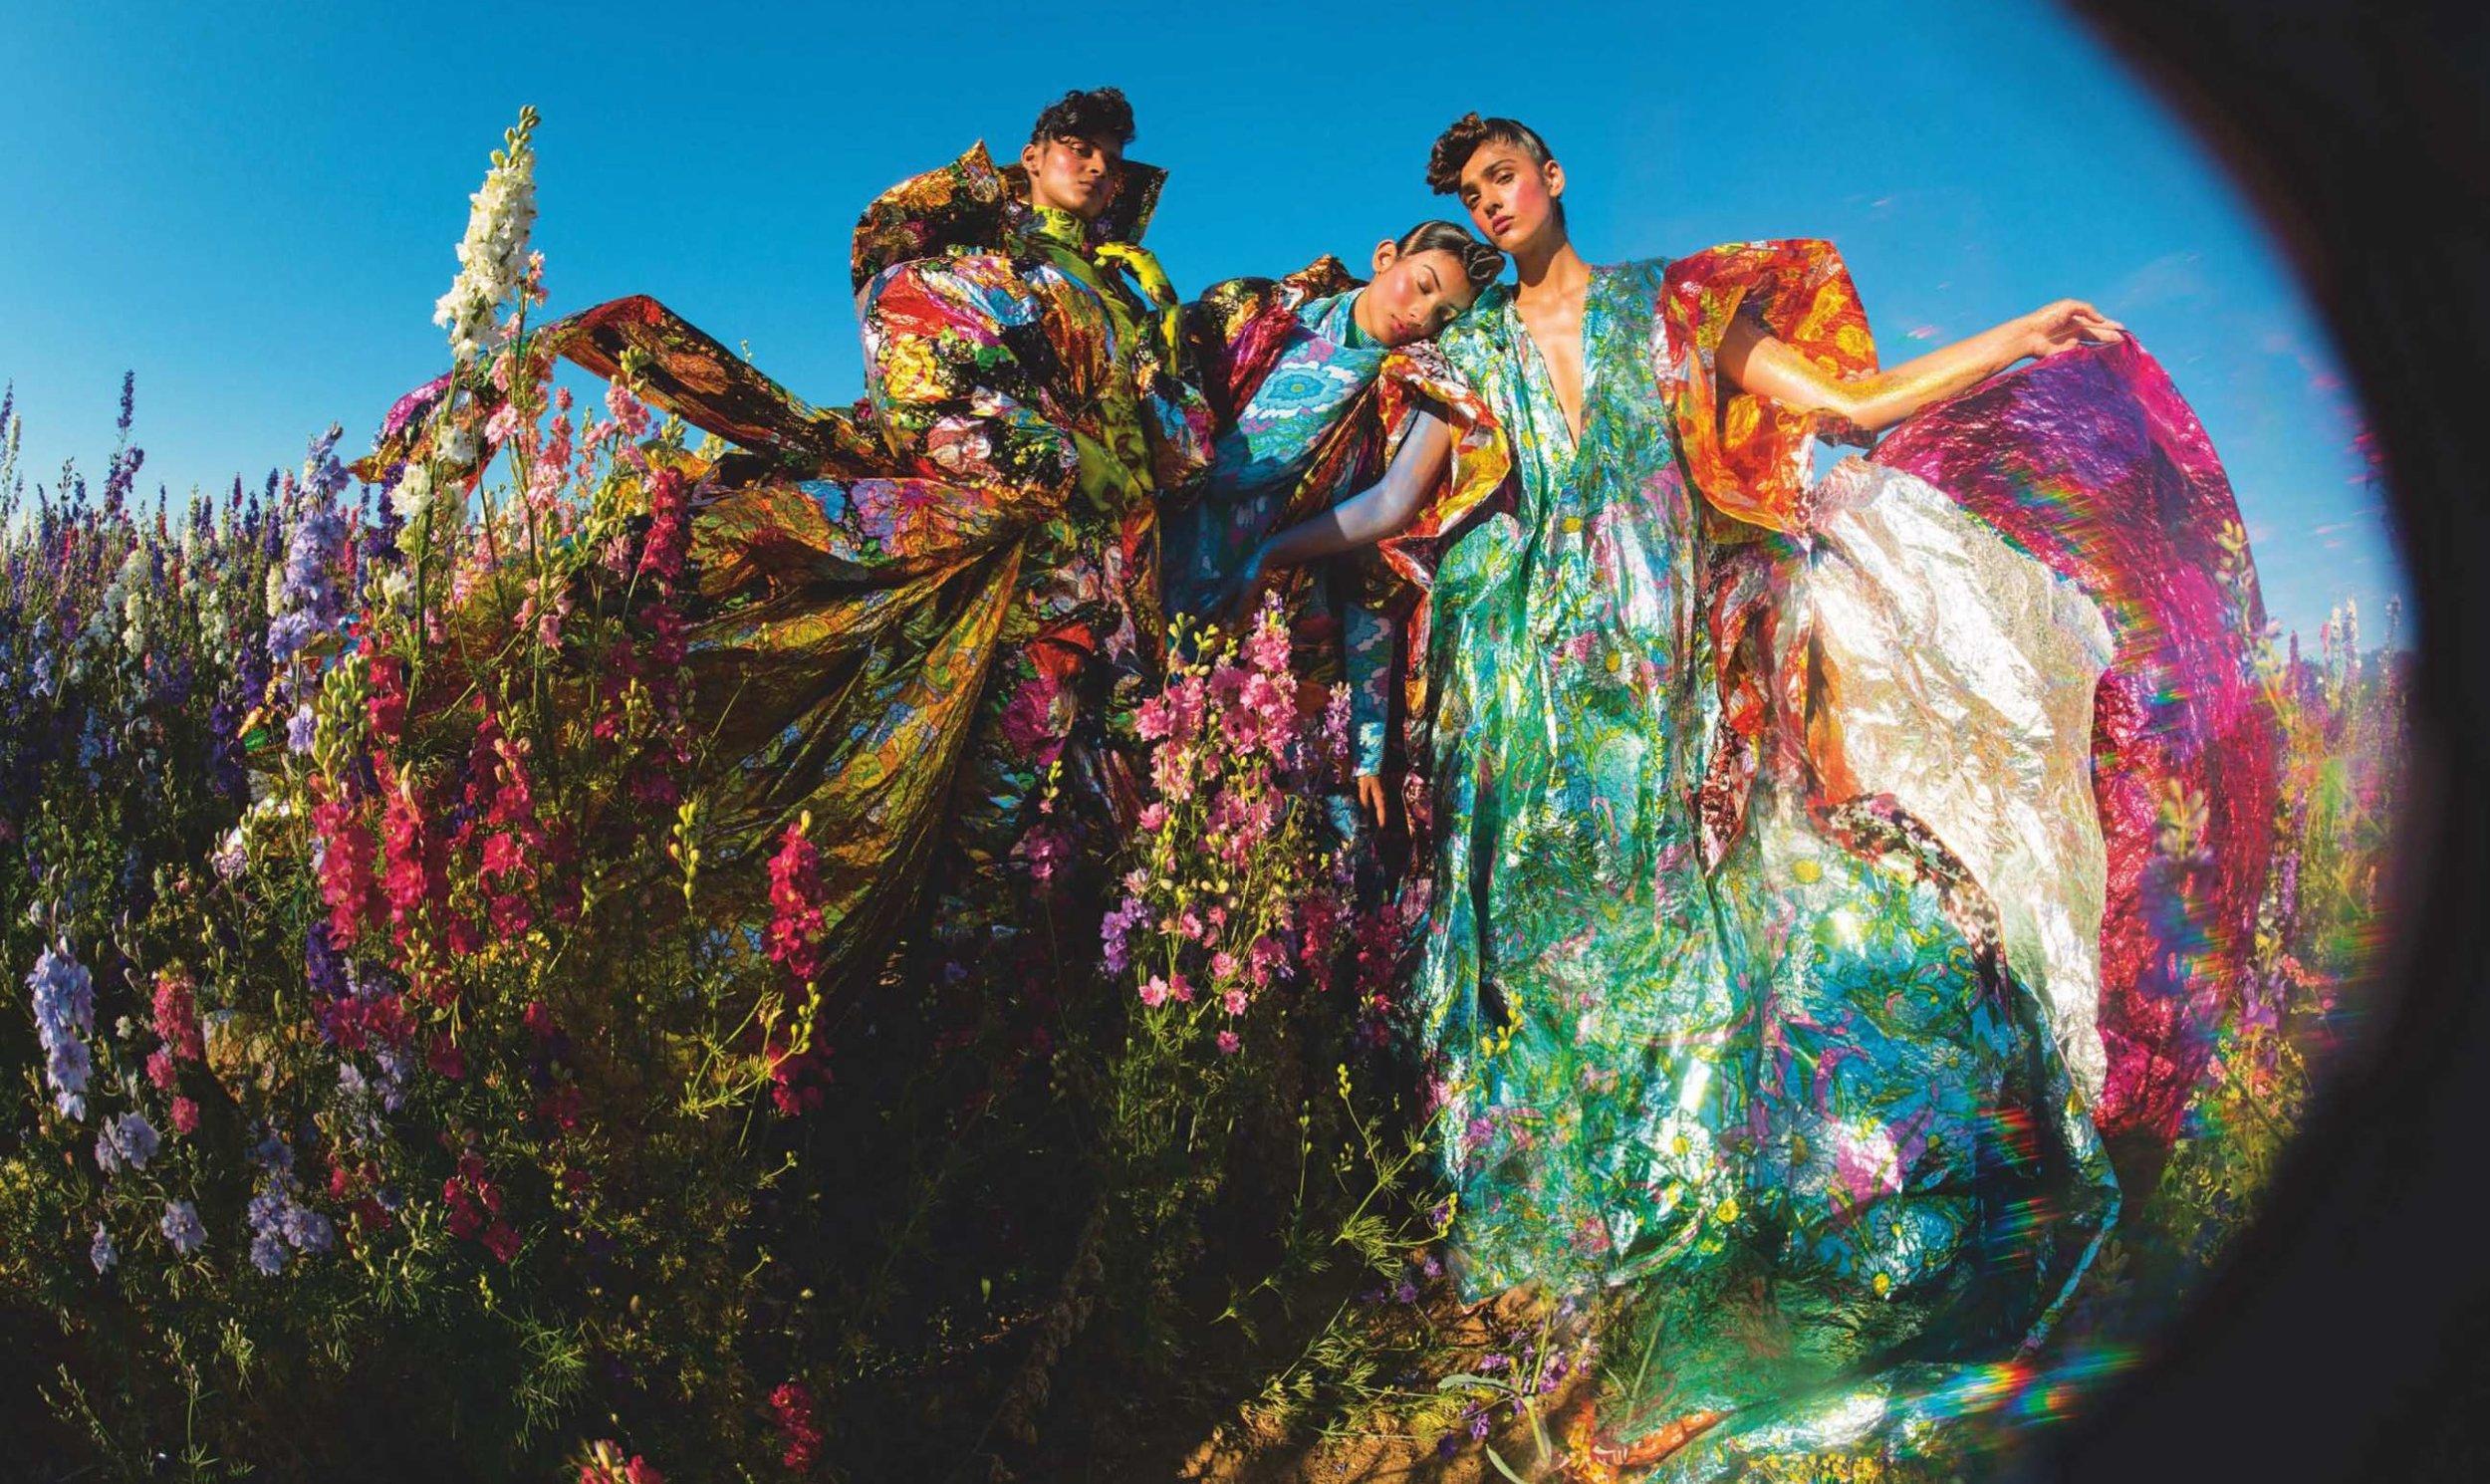 13-Tim Walker Vogue US Dec 2018.jpg